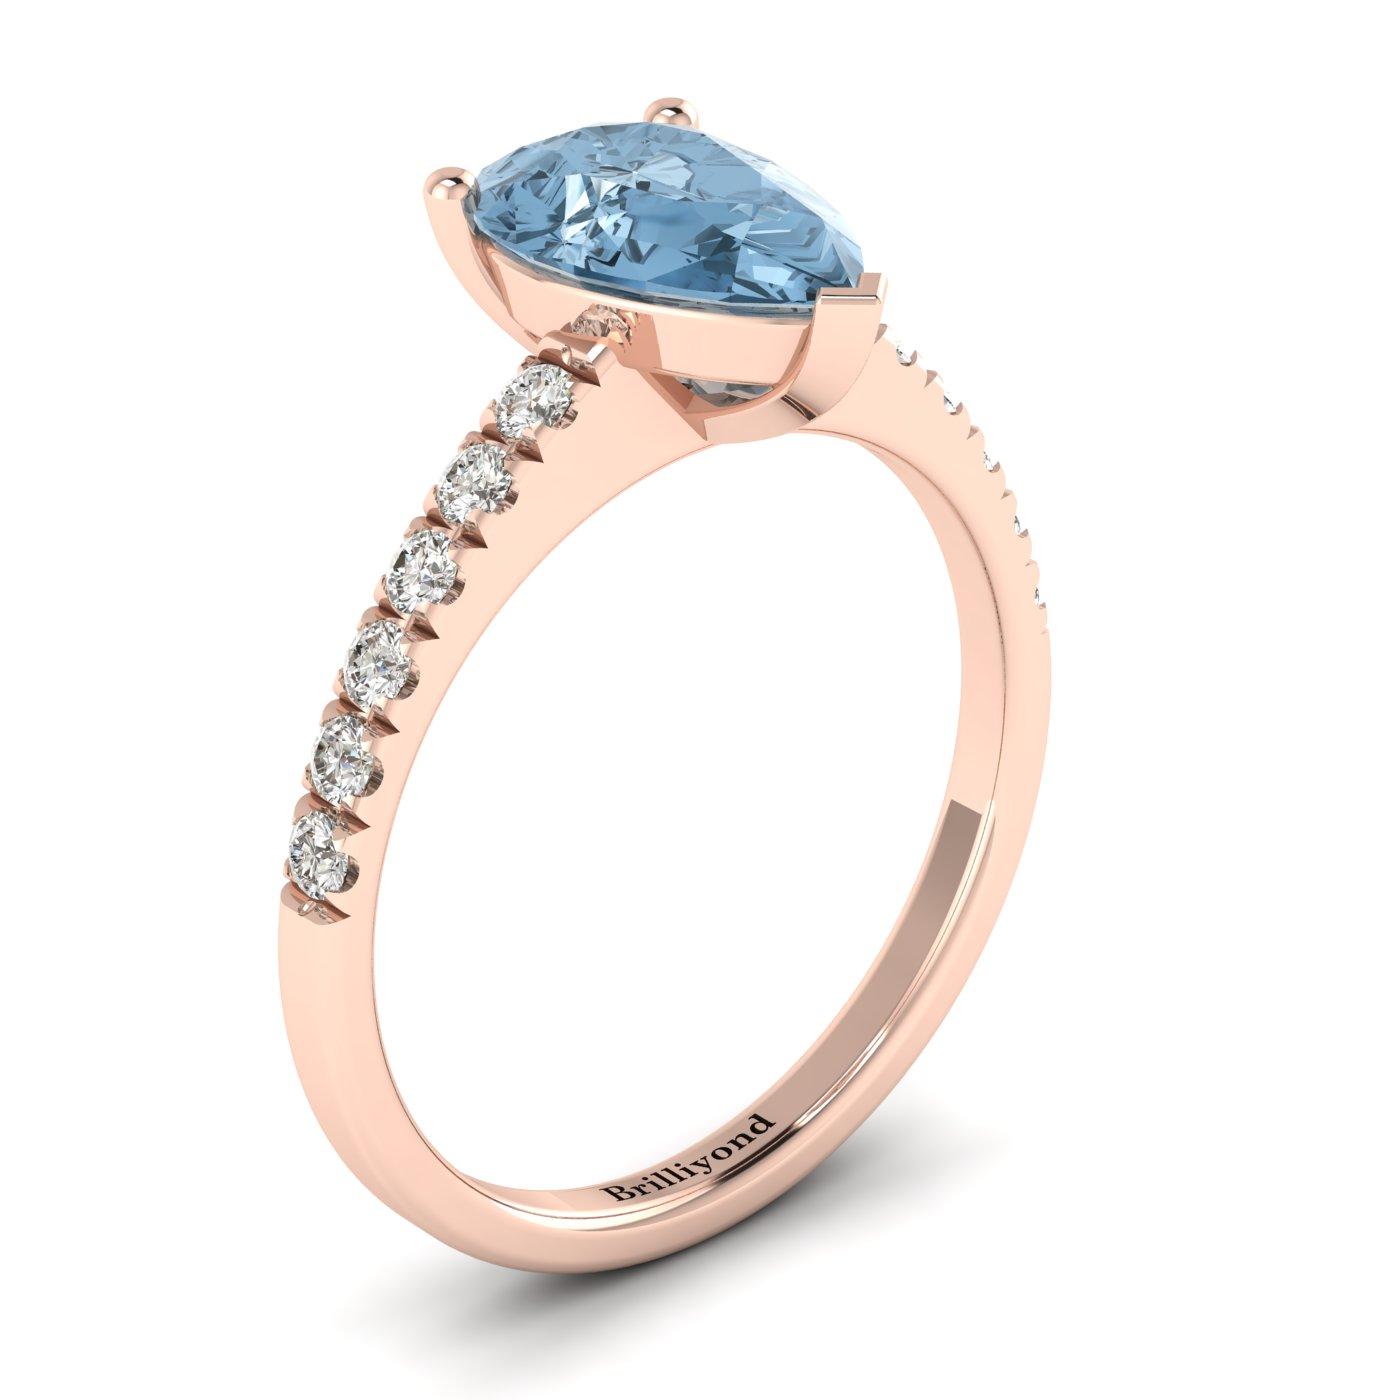 Three Pronged Aquamarine and Diamonds Solitaire Engagement Ring in Australia